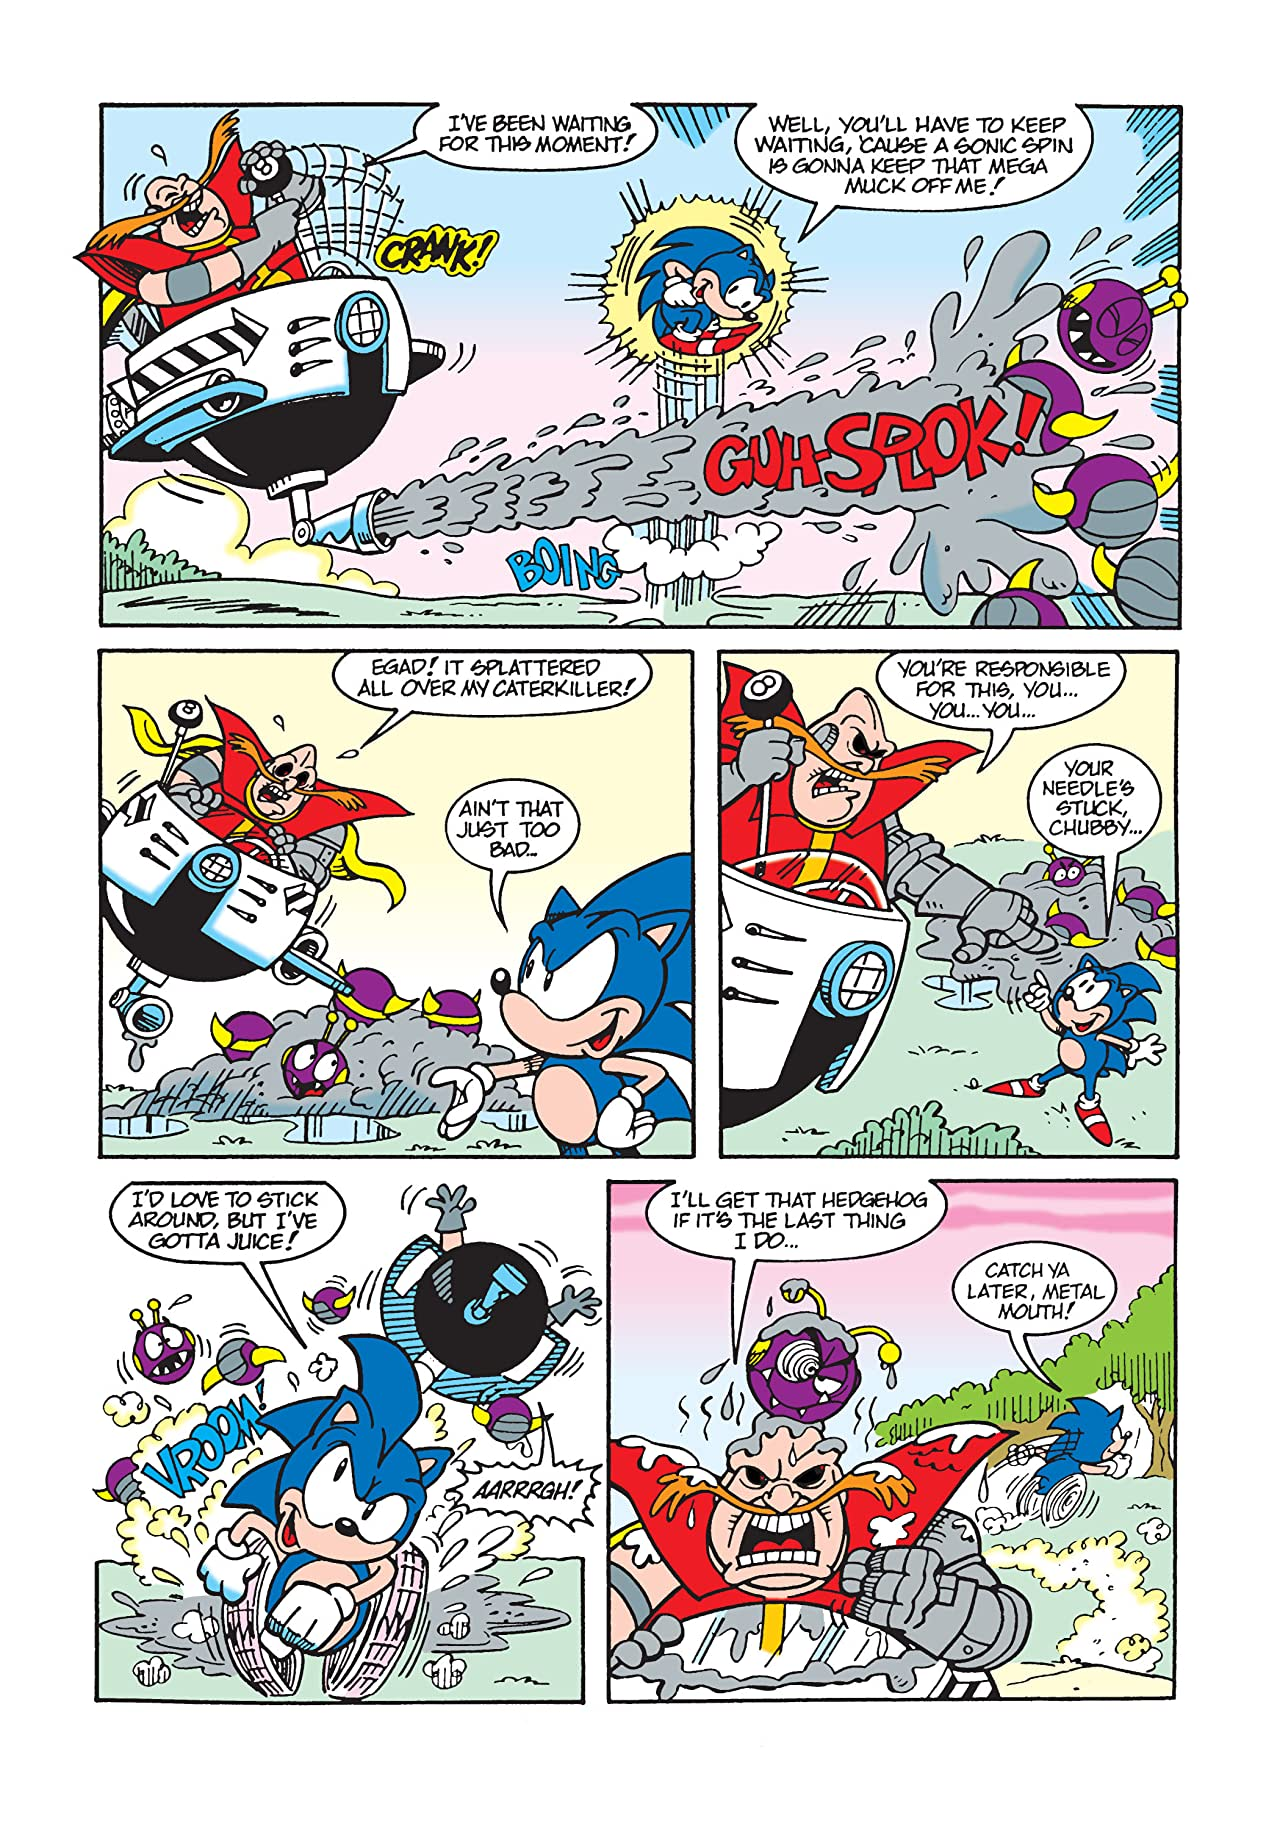 Sonic the Hedgehog Mini Series #0